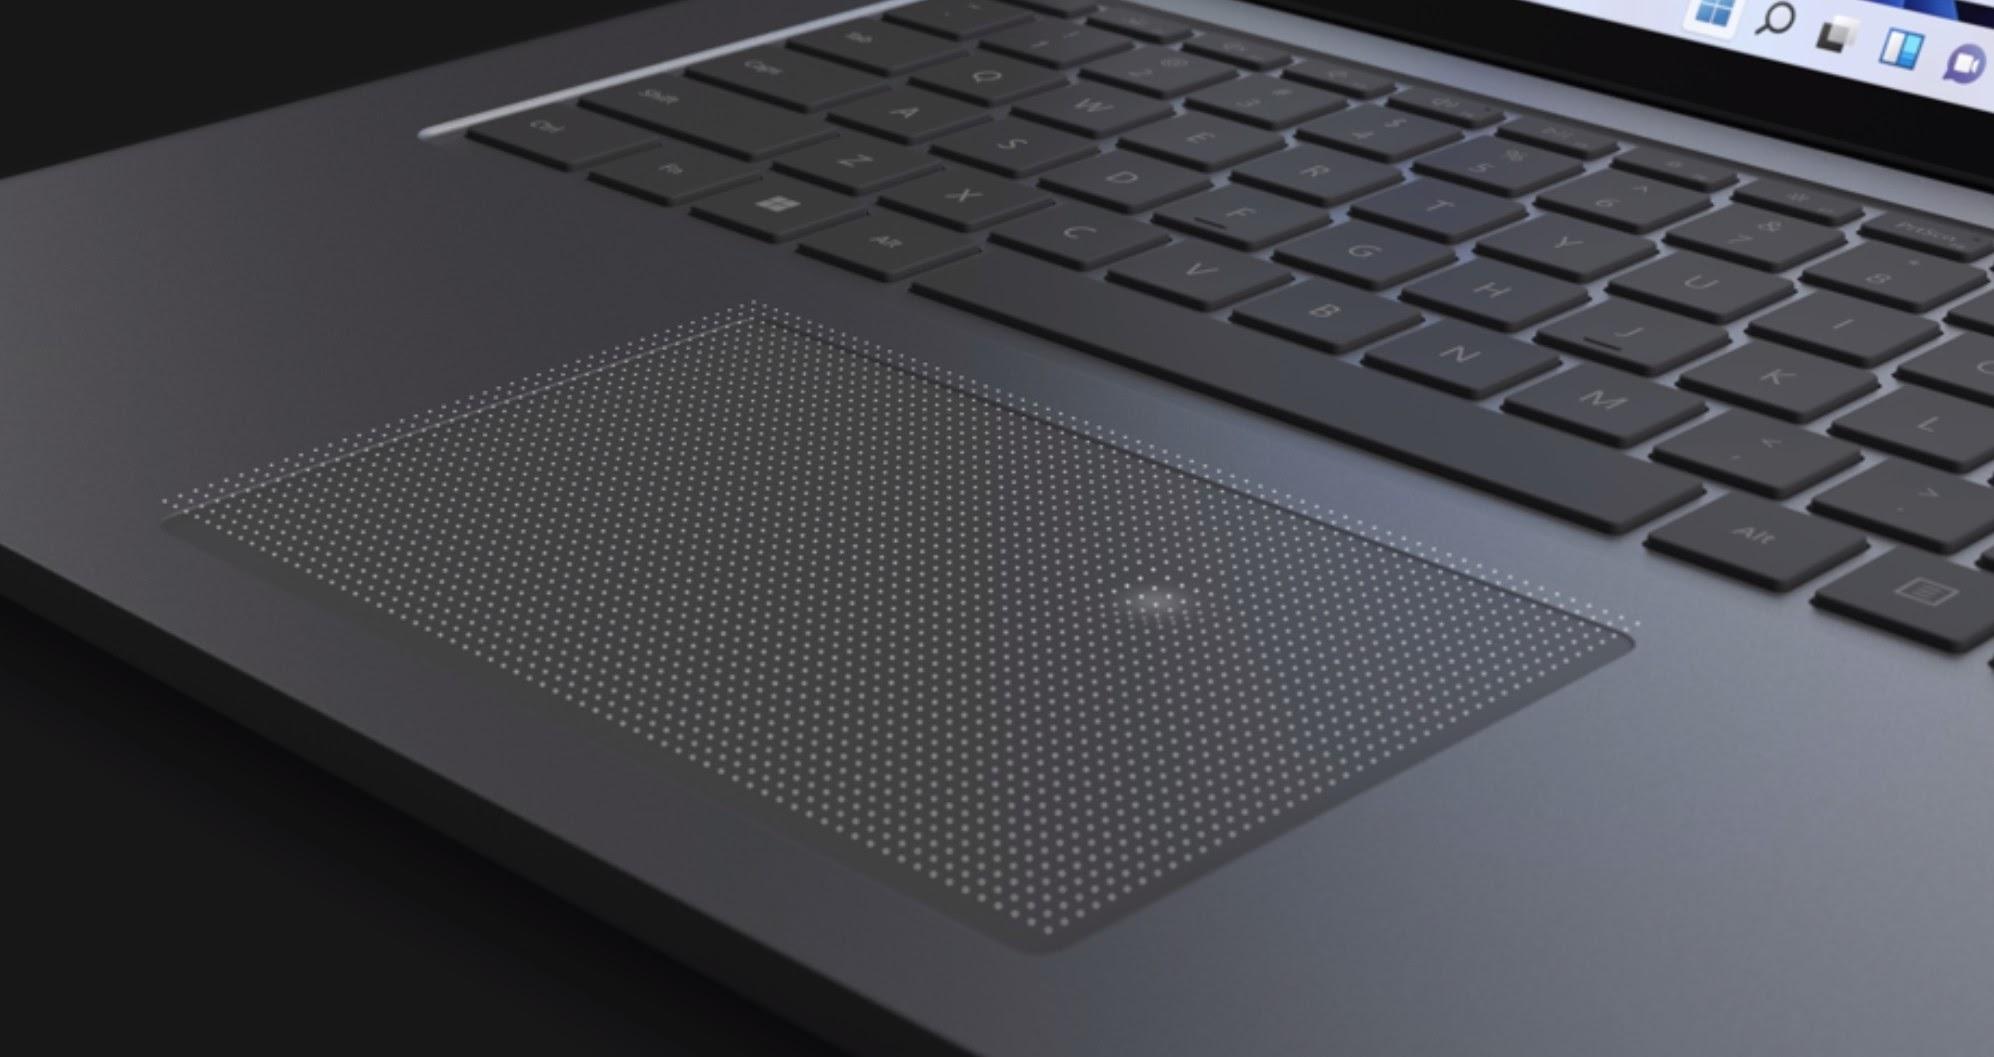 ban-di-chuot-surface-laptop-studio